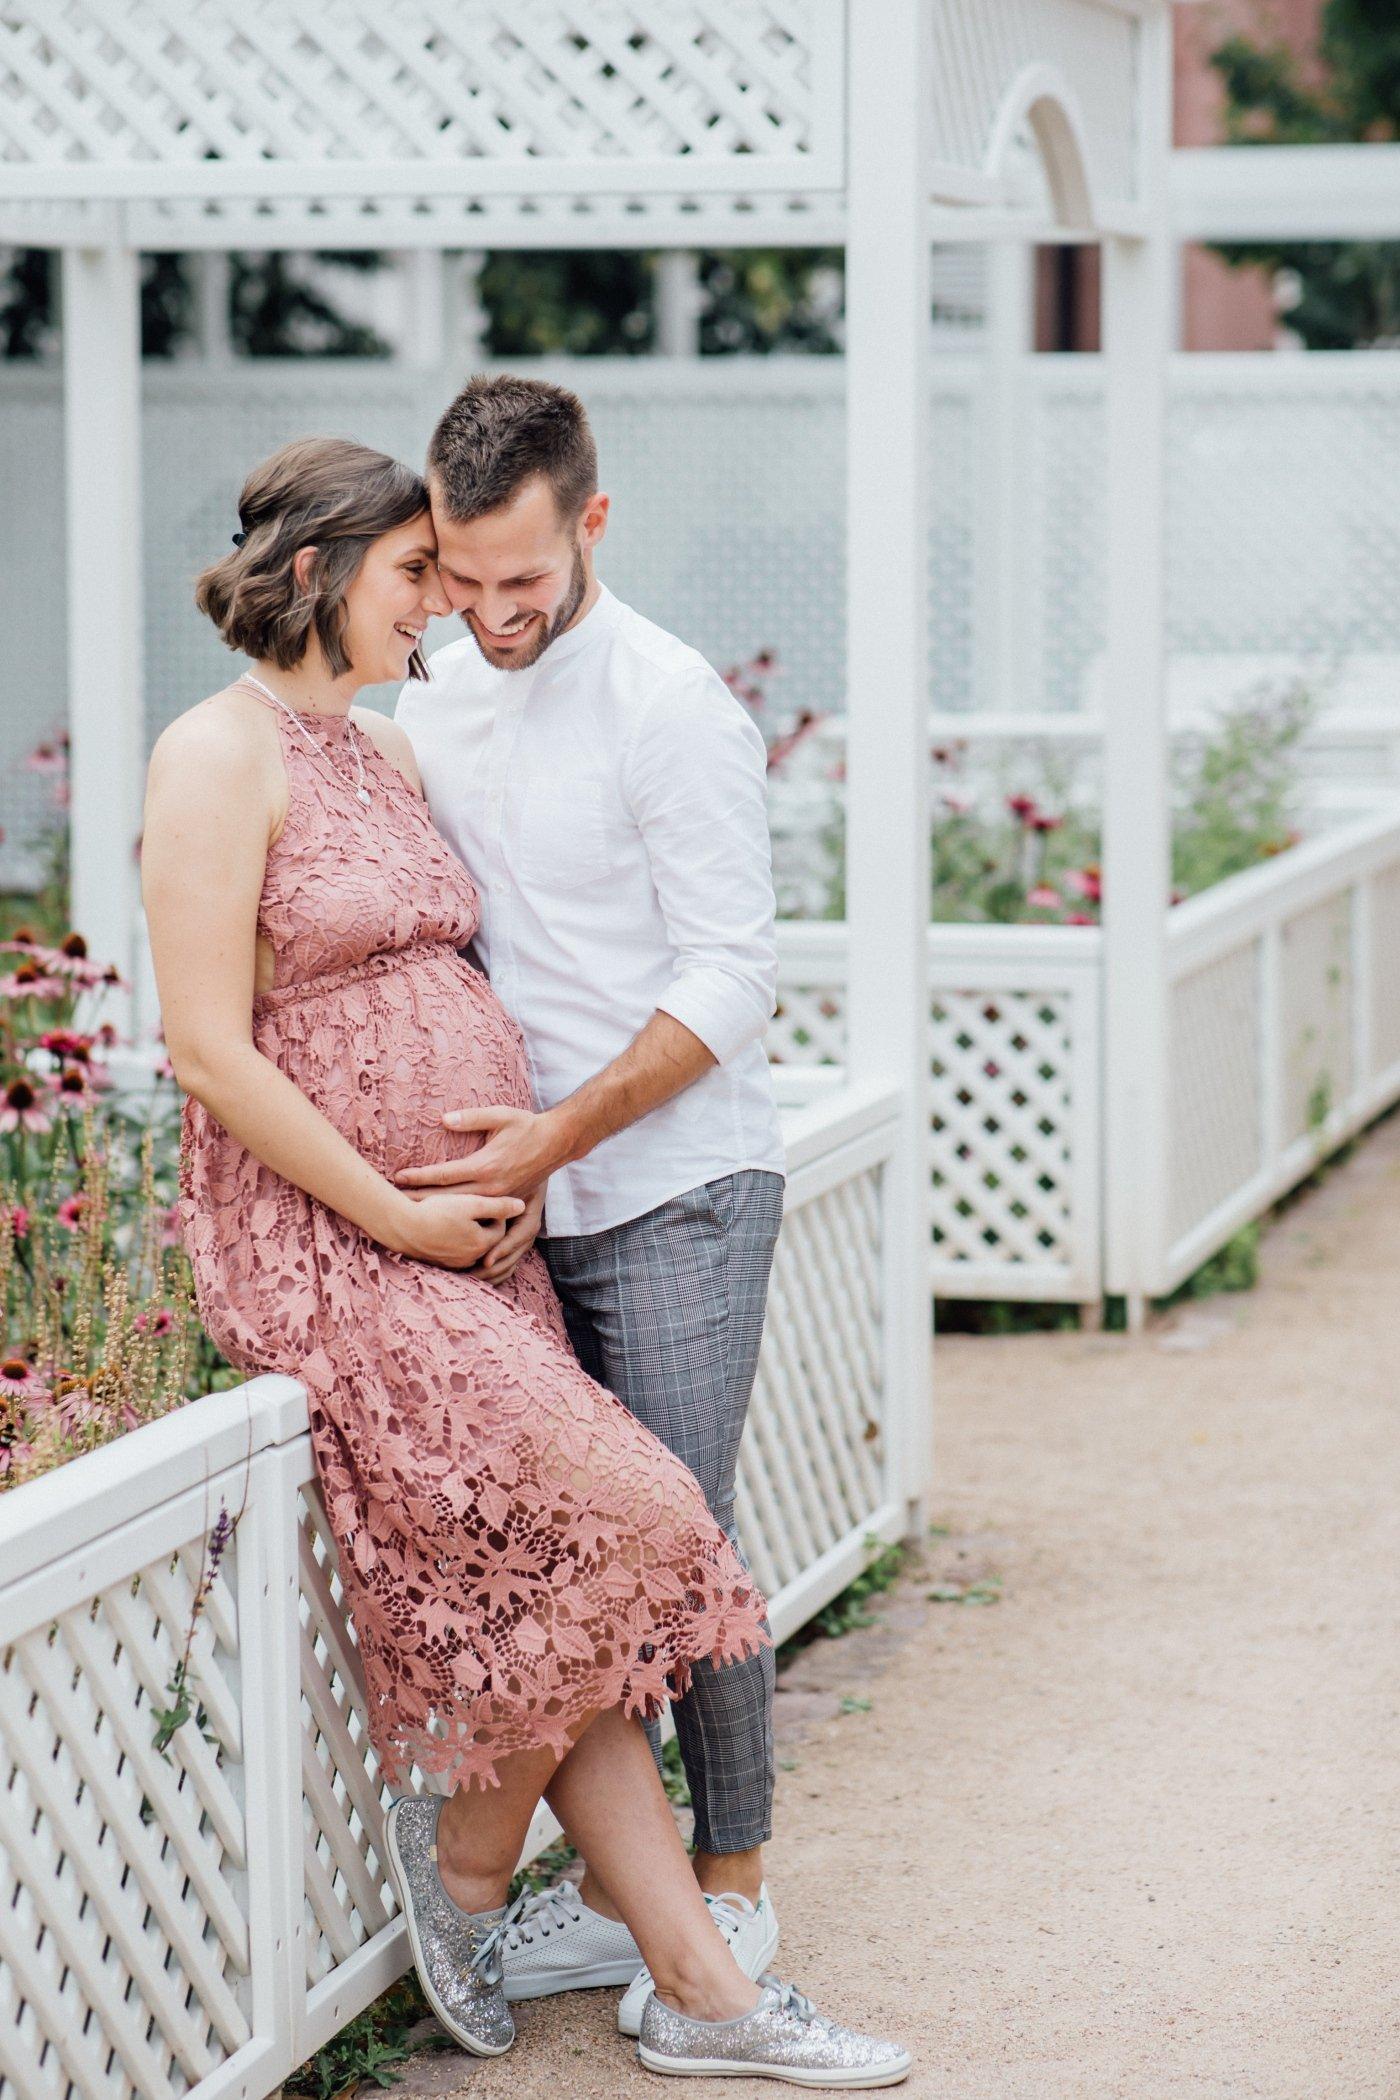 Couple-Photography-Babybauchfoto